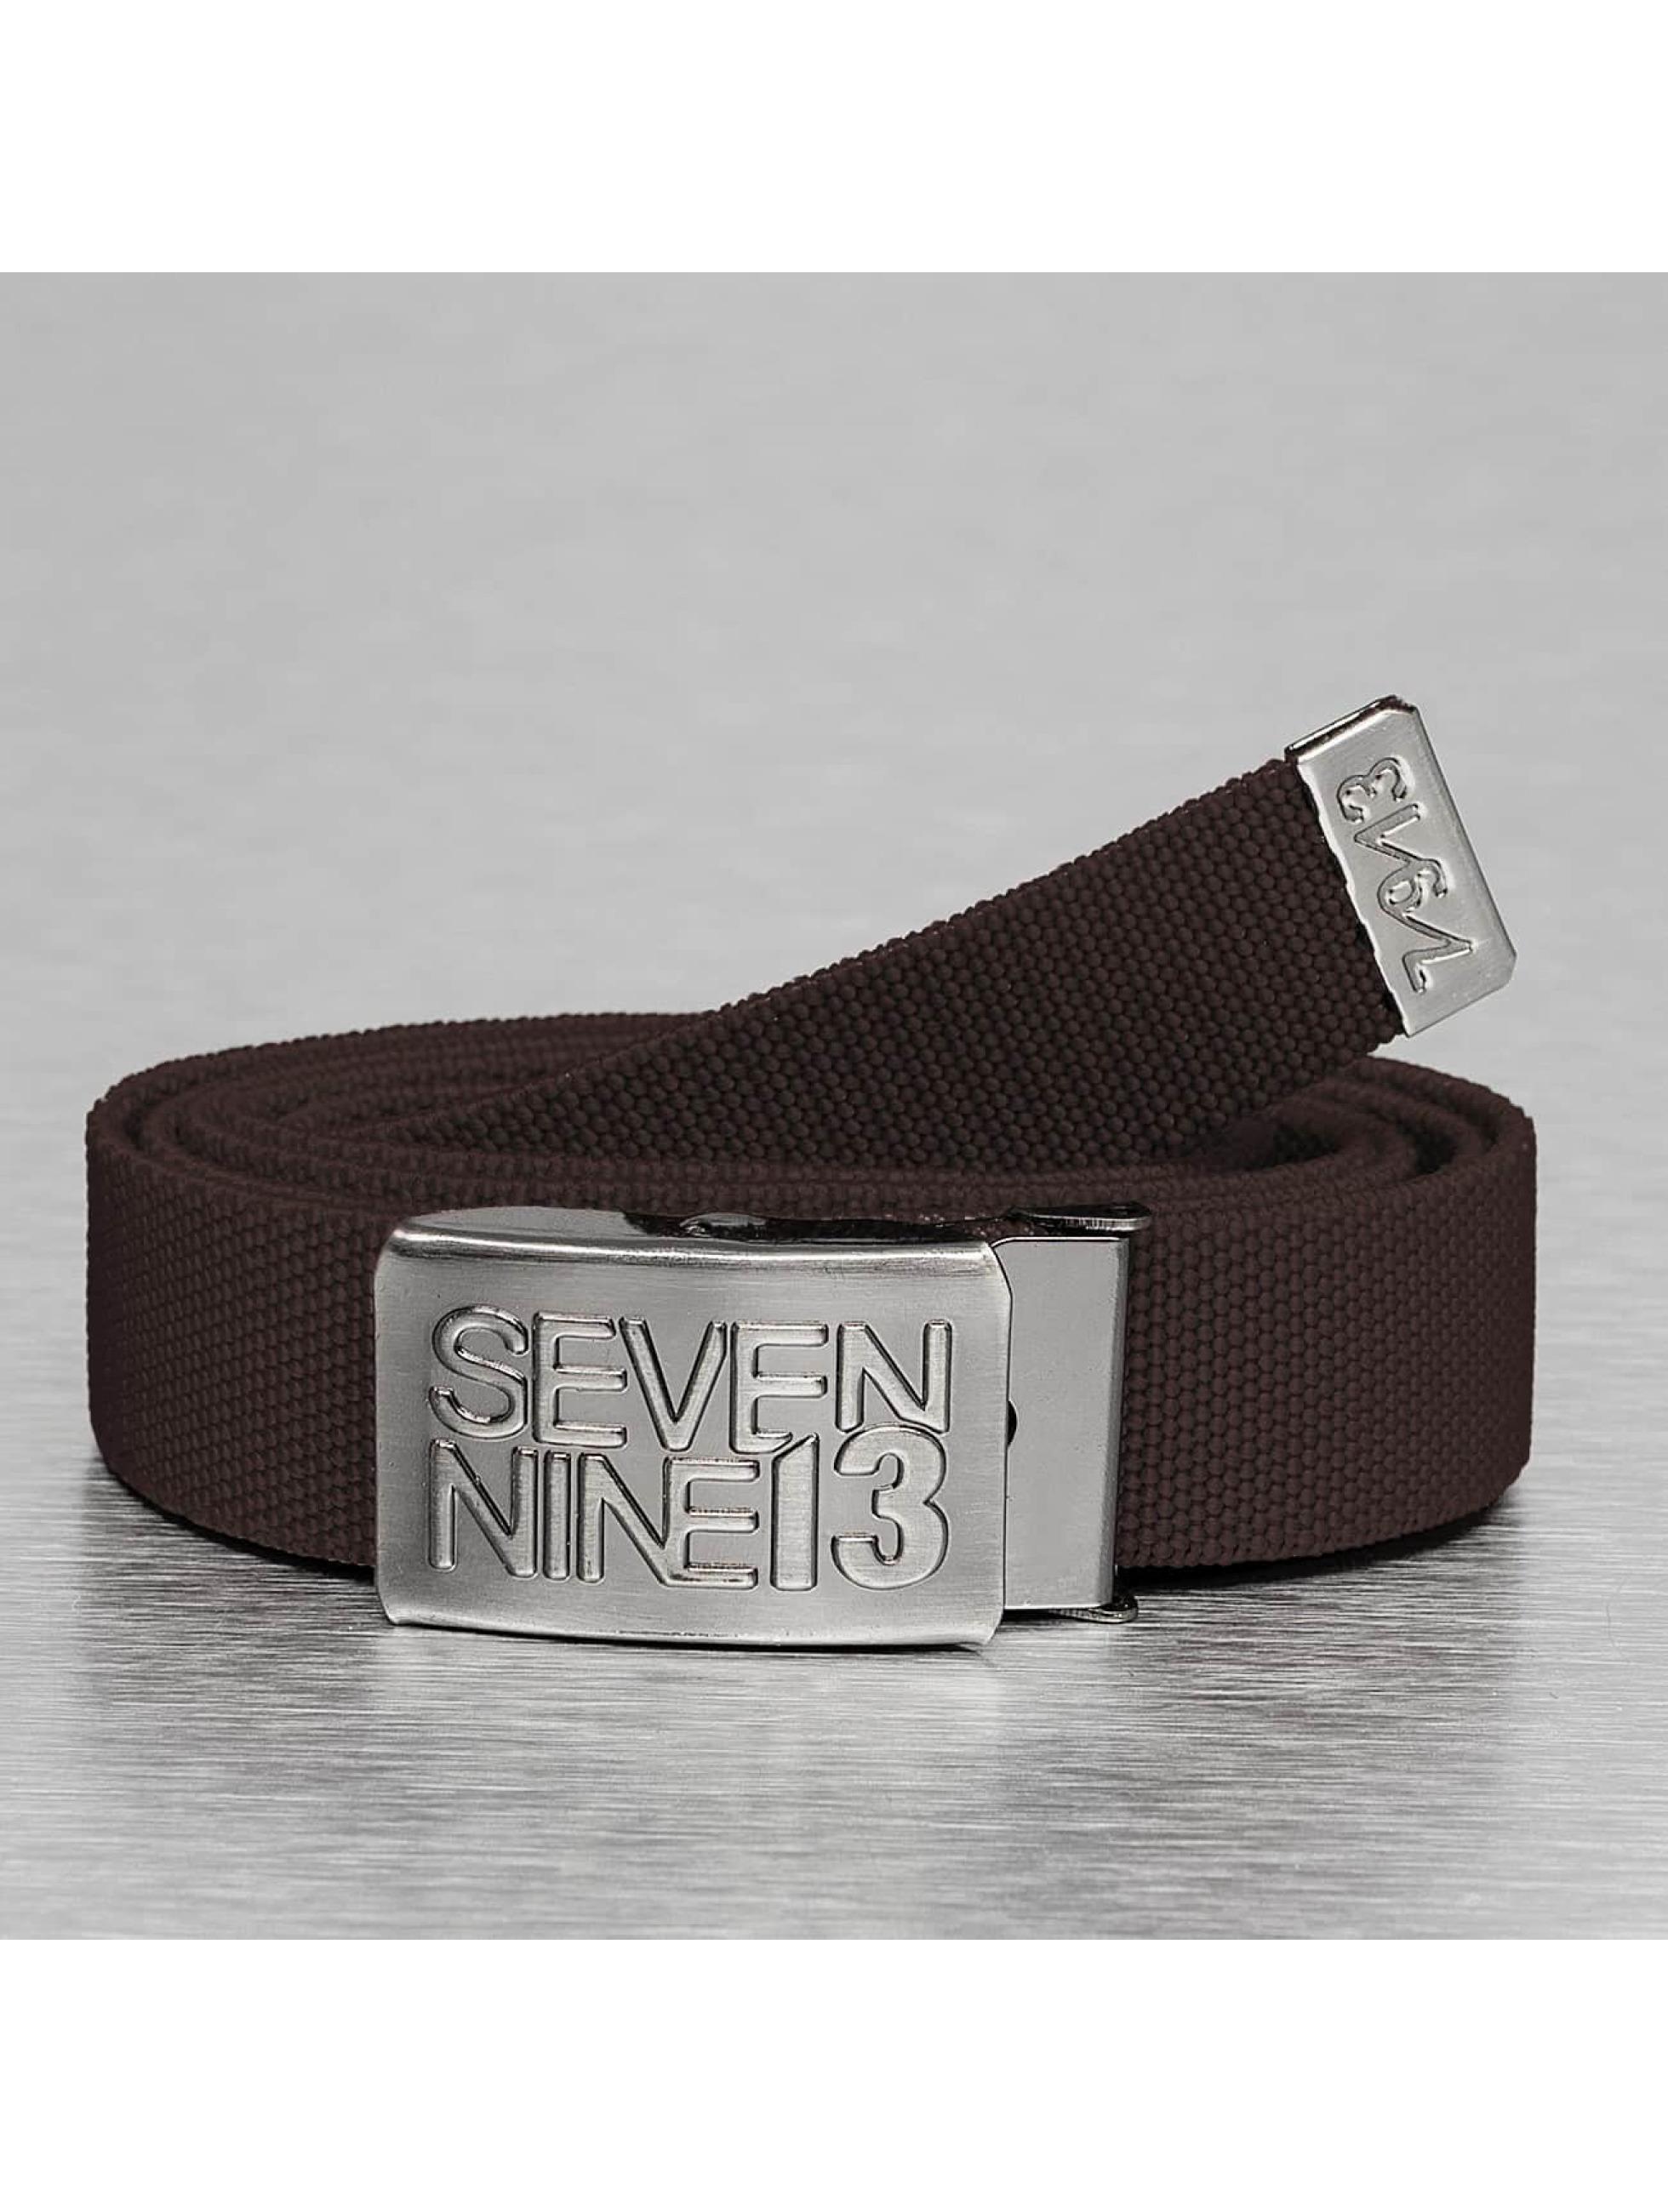 Seven Nine 13 Ремень Jaws Stretch коричневый